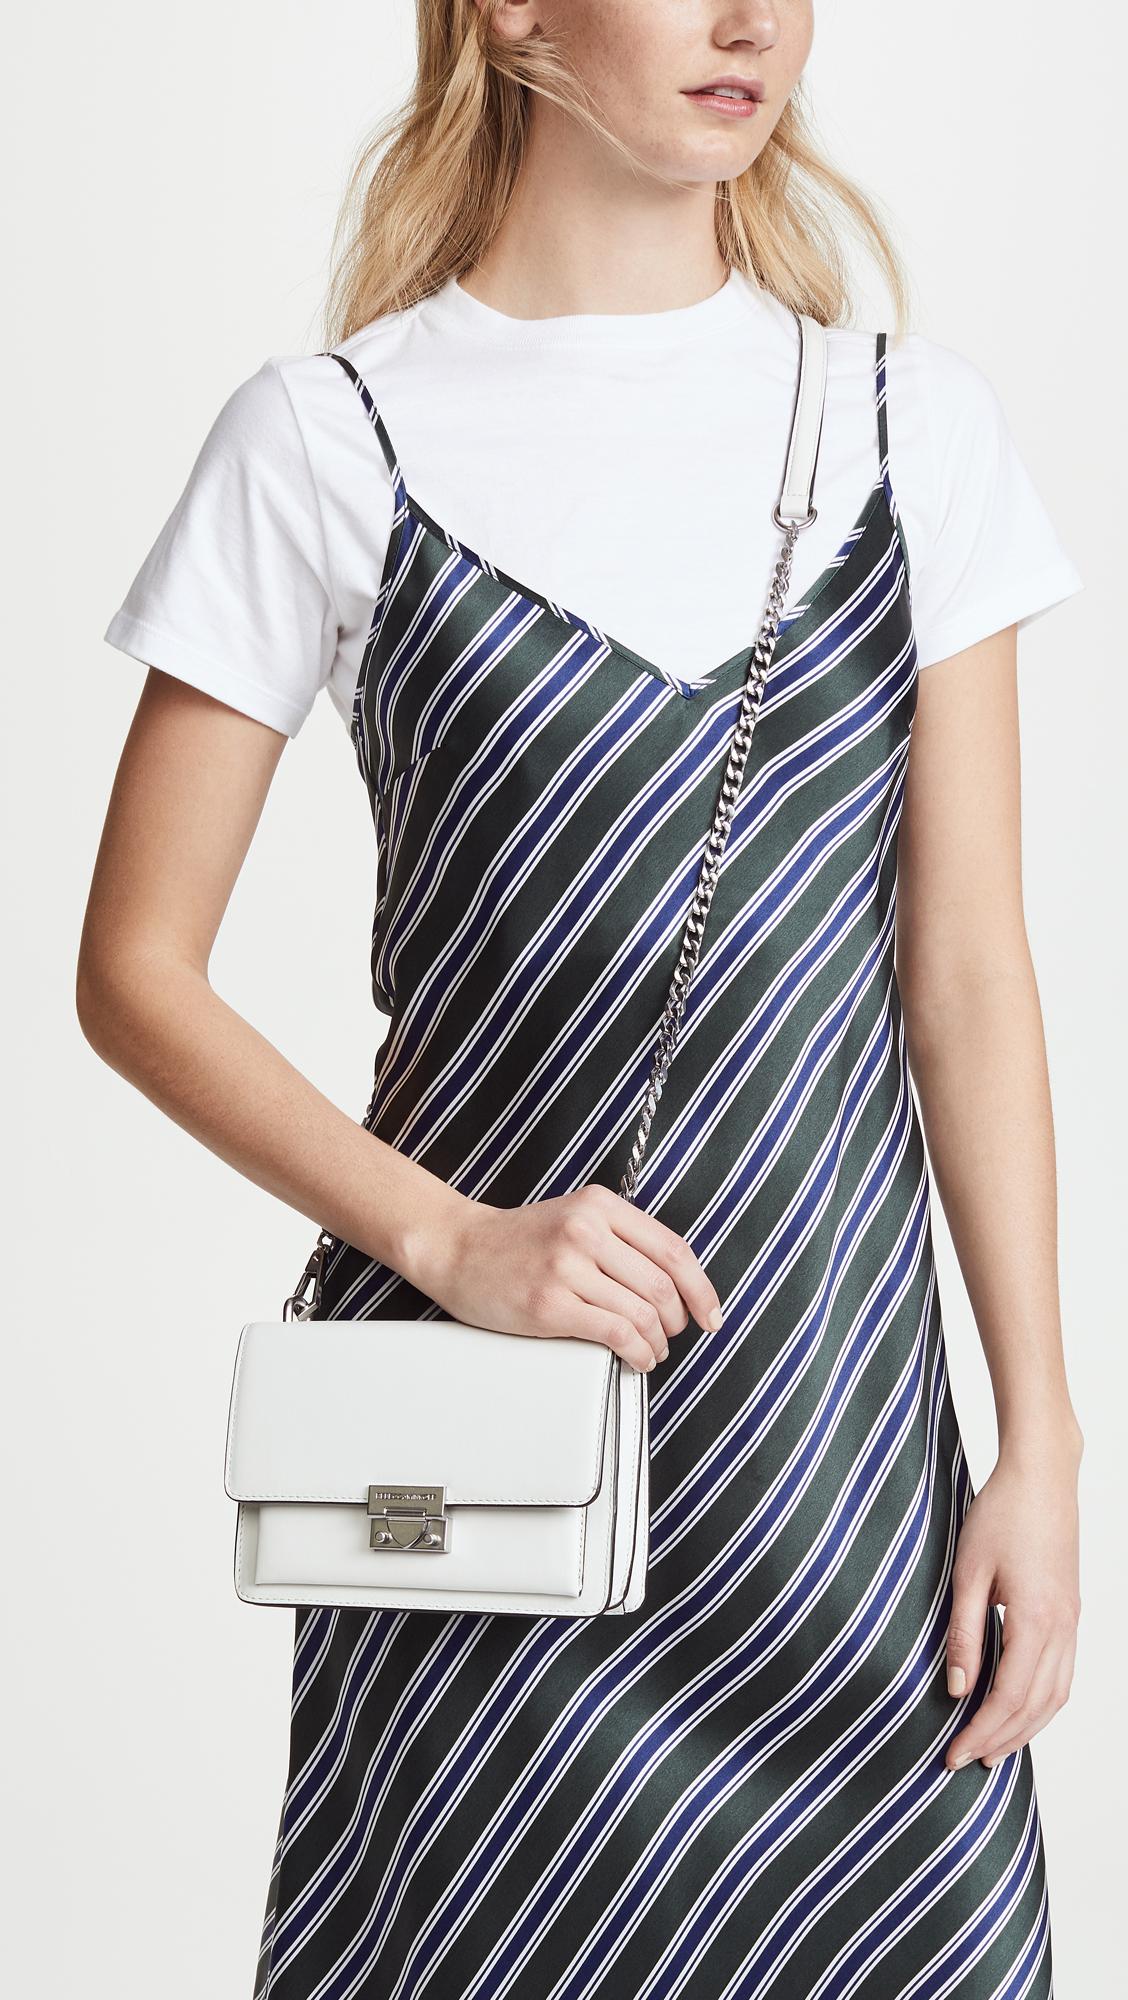 e49968c7db03 Rebecca Minkoff Christy Small Shoulder Bag